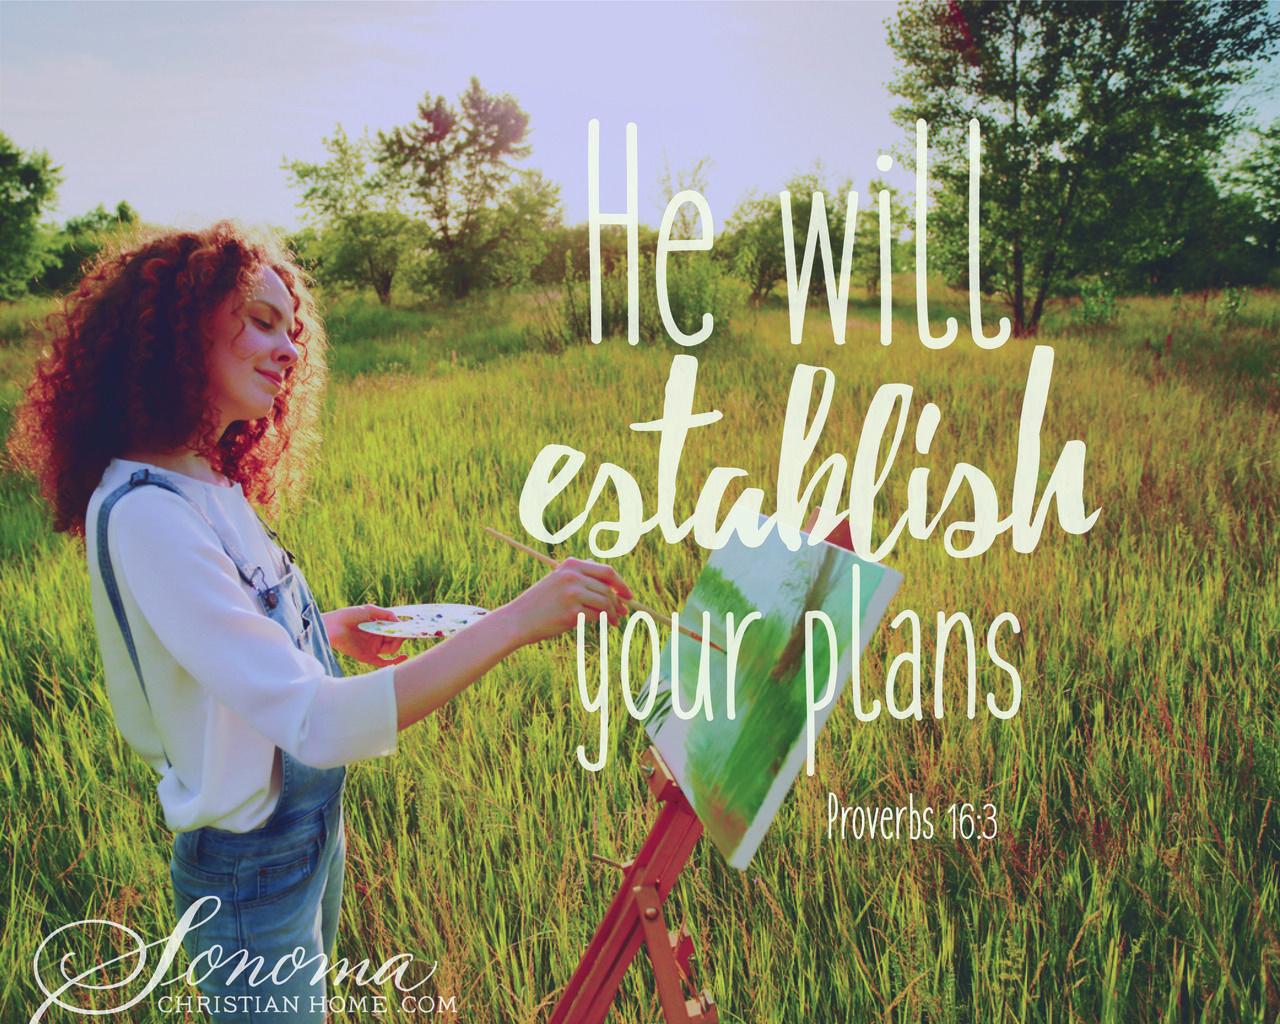 He will establish your plans - Proverbs 16:3 #Christian #Faith #TrustGod #Prayer #Salvation http://bit.ly/1r3nXZx